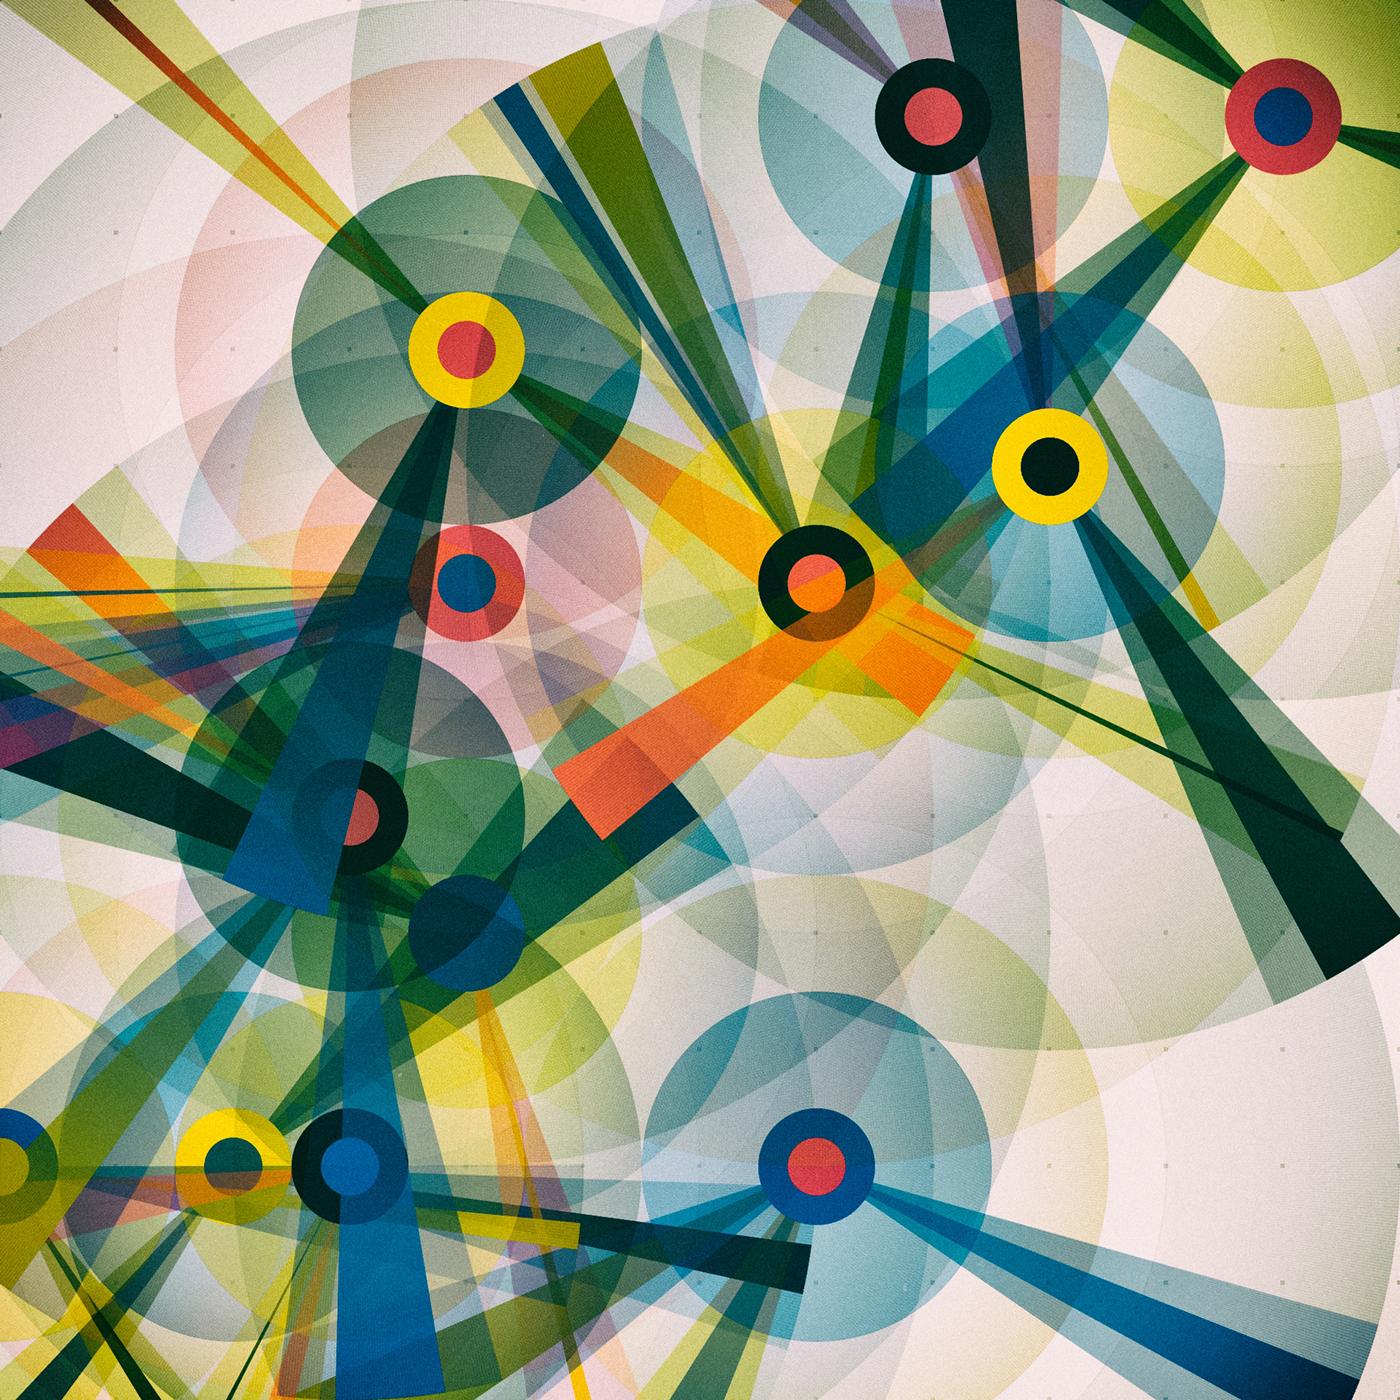 processing,generative,design,art,code,math,geometric,abstract